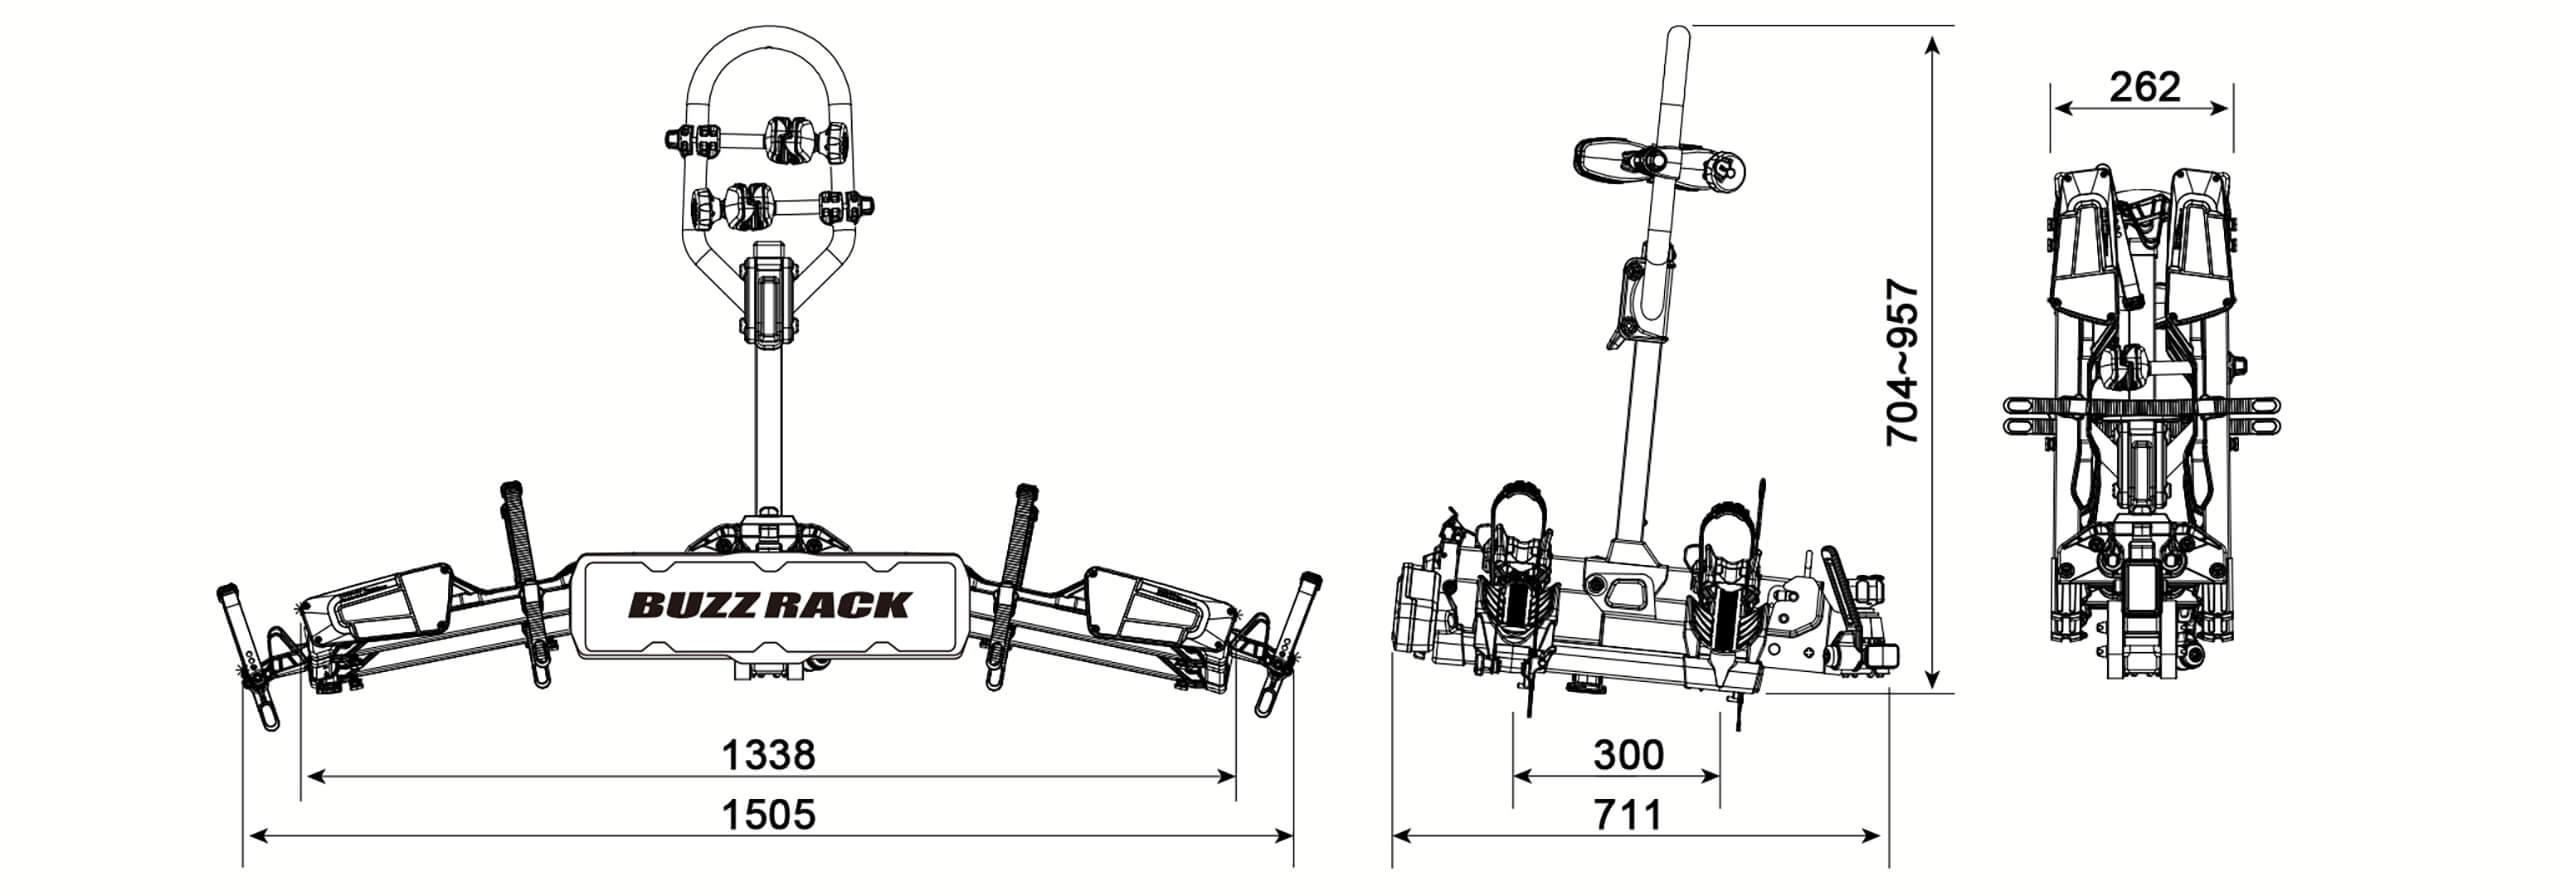 Buzz Rack E Scorpion 2 Bike Folding Rack No Brp612